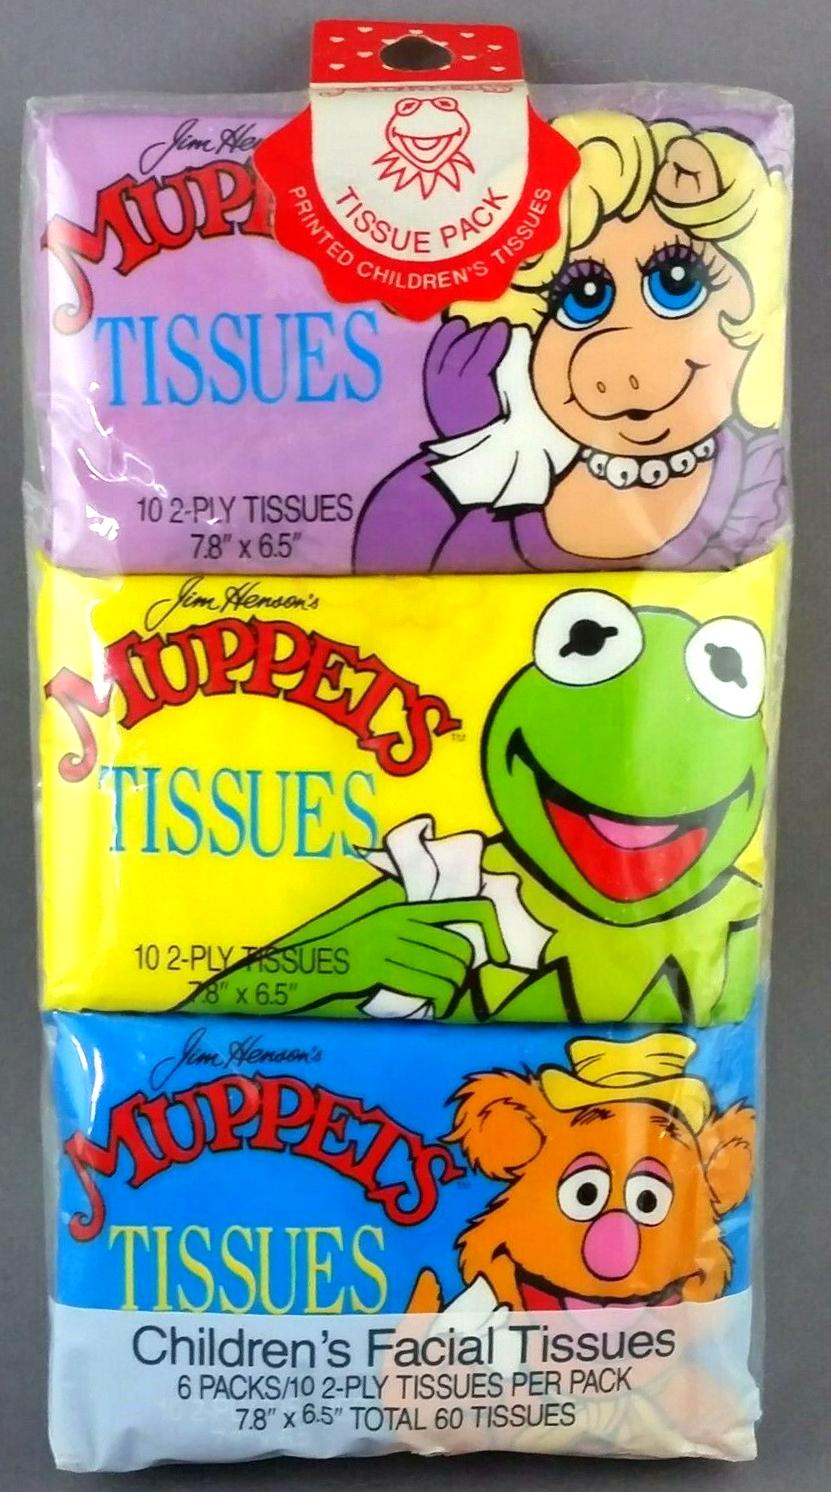 File:Ducair tissues.JPG